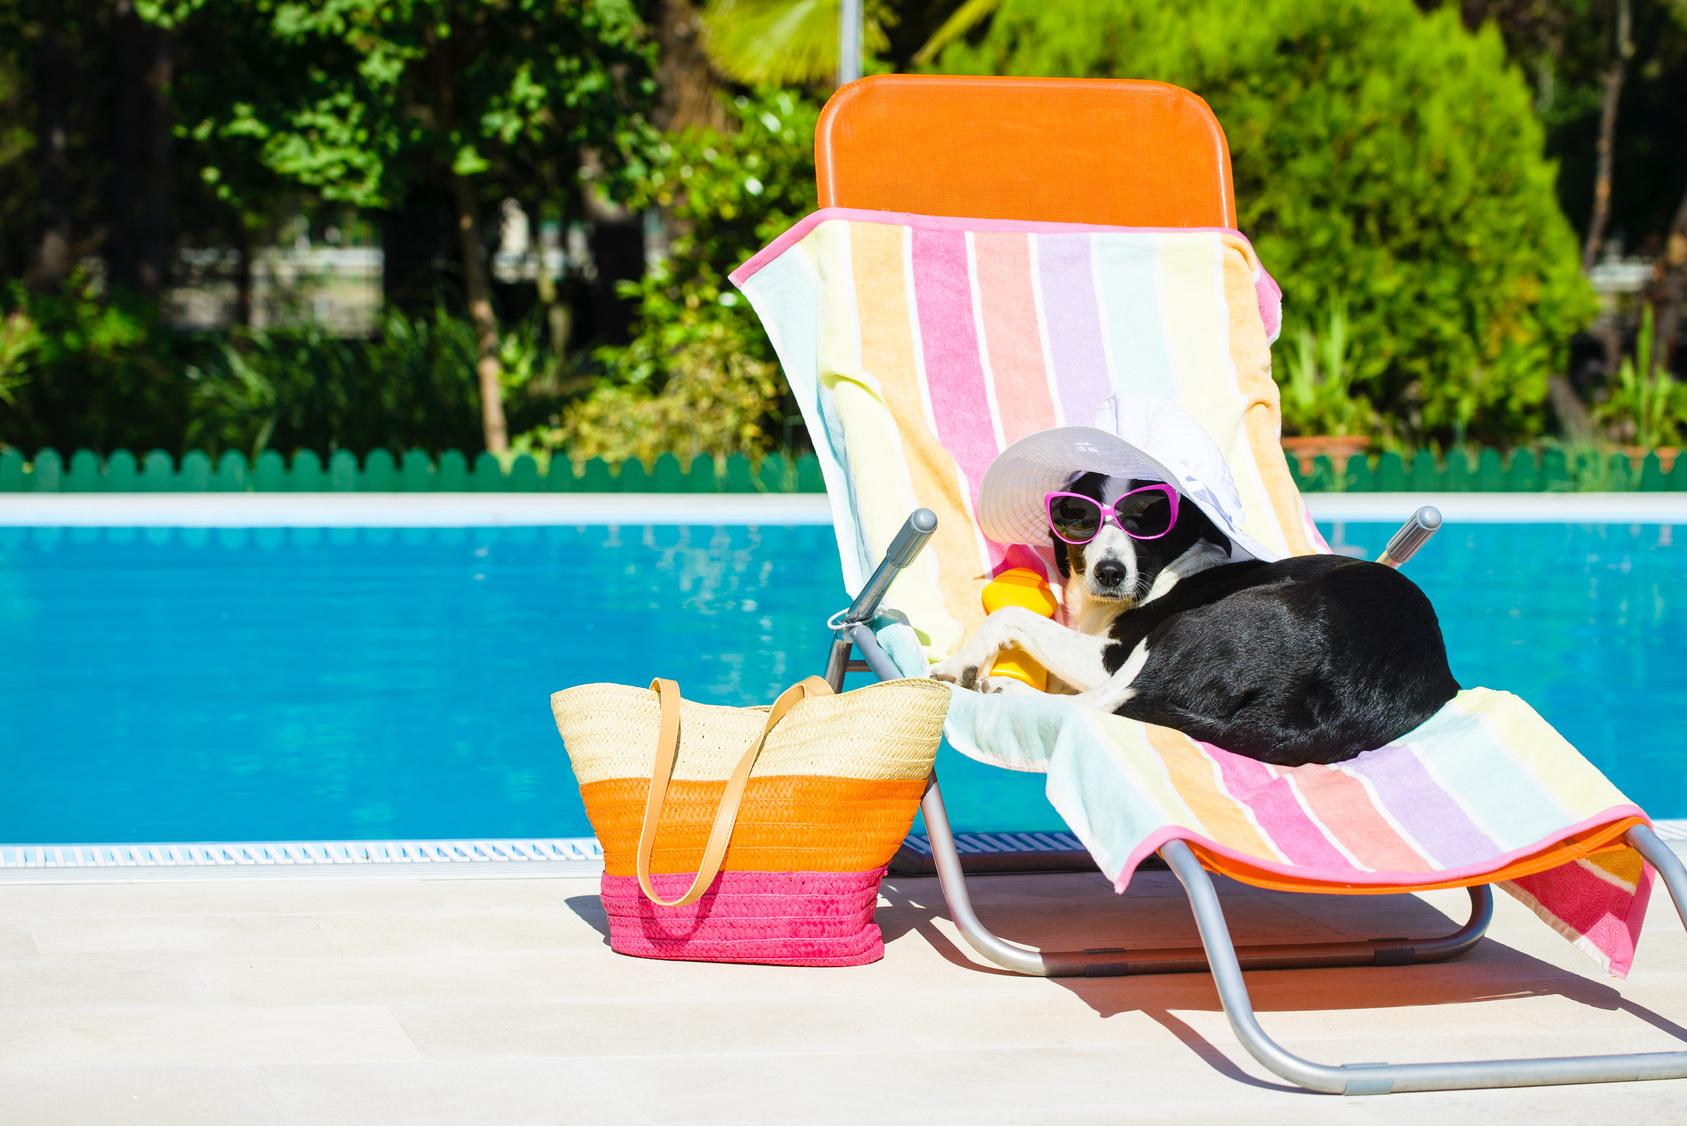 Cuidando dos pets nos dias quentes!